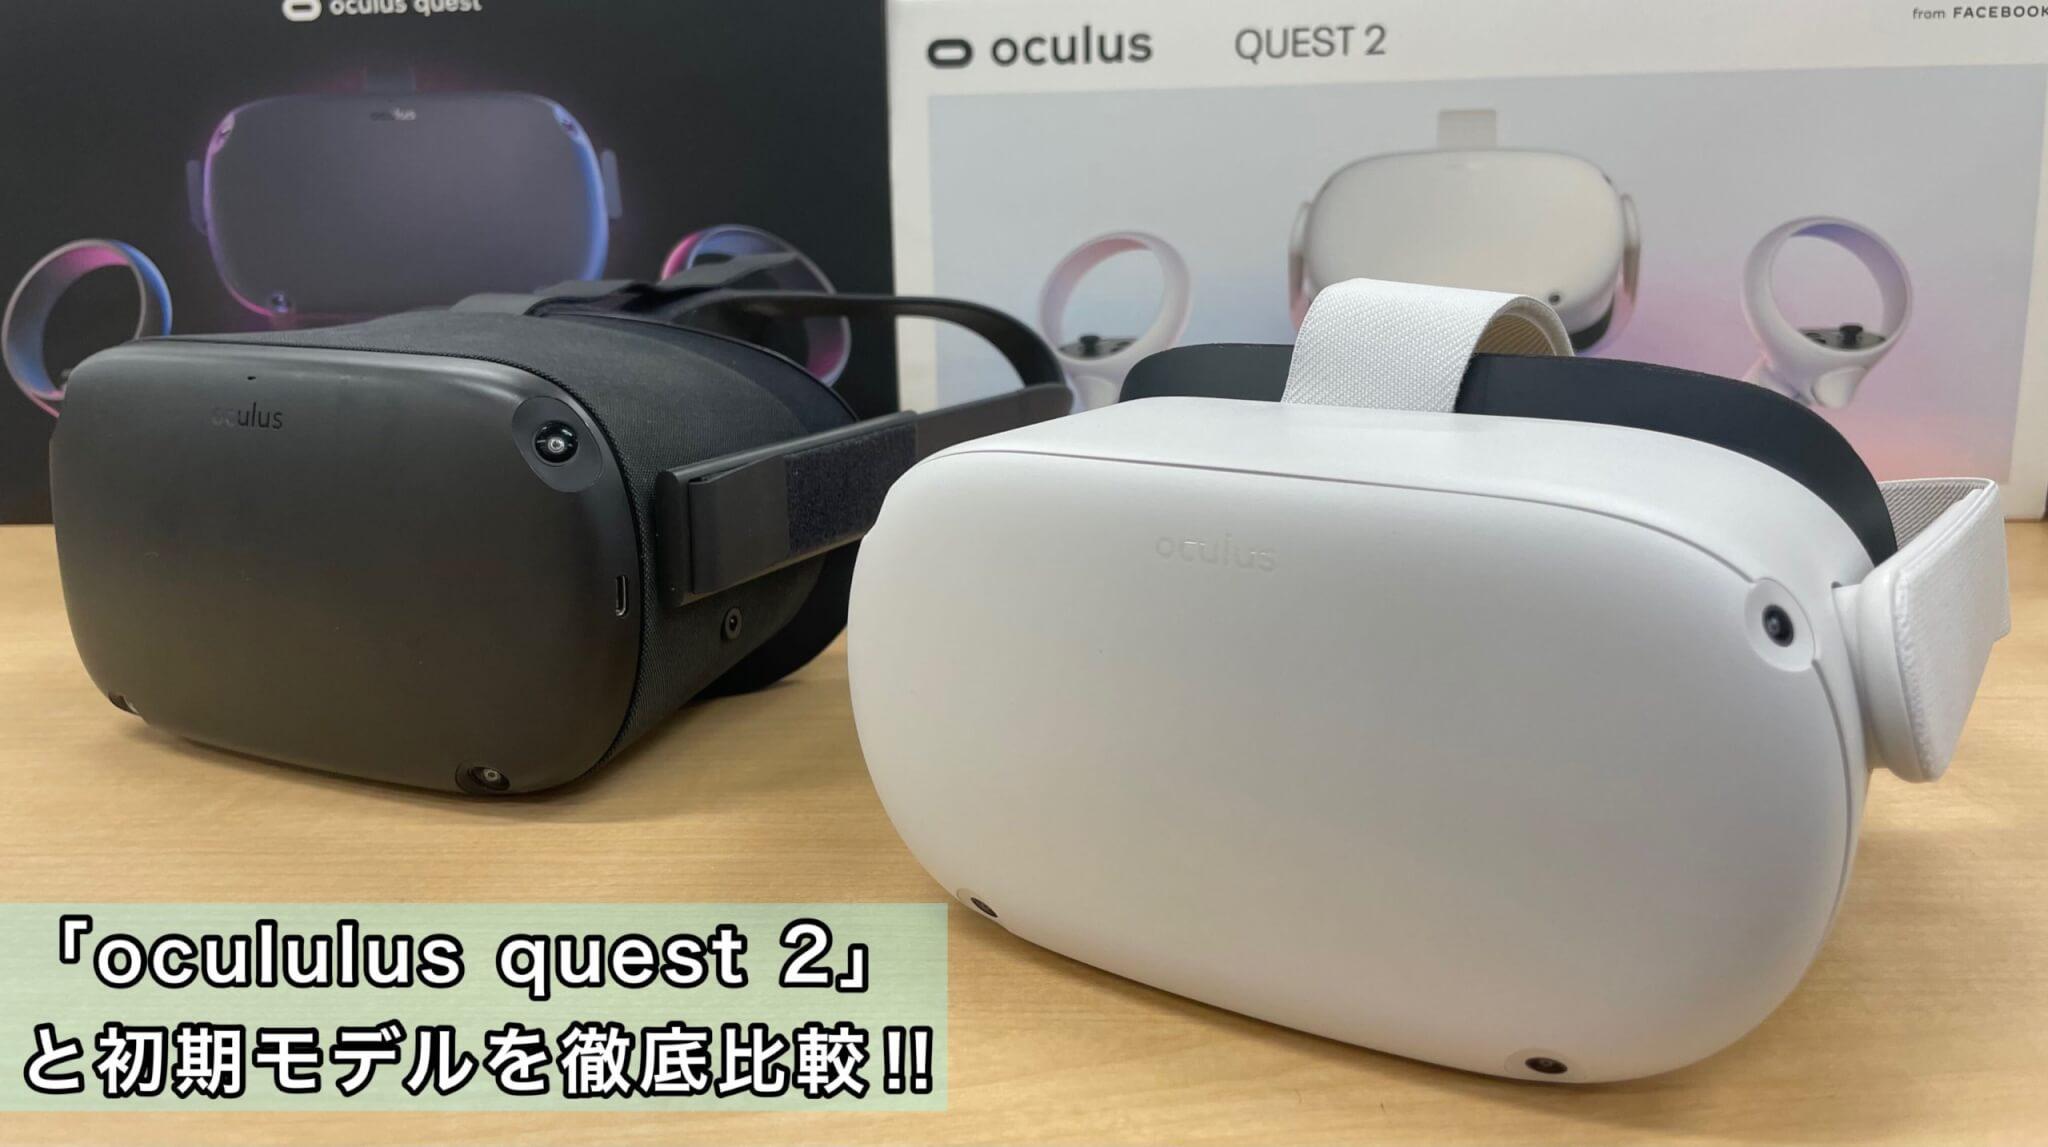 「Oculus Quest 2」の実機レビュー!旧型の「Oculus Quest」と比較して分かった改善点と違い